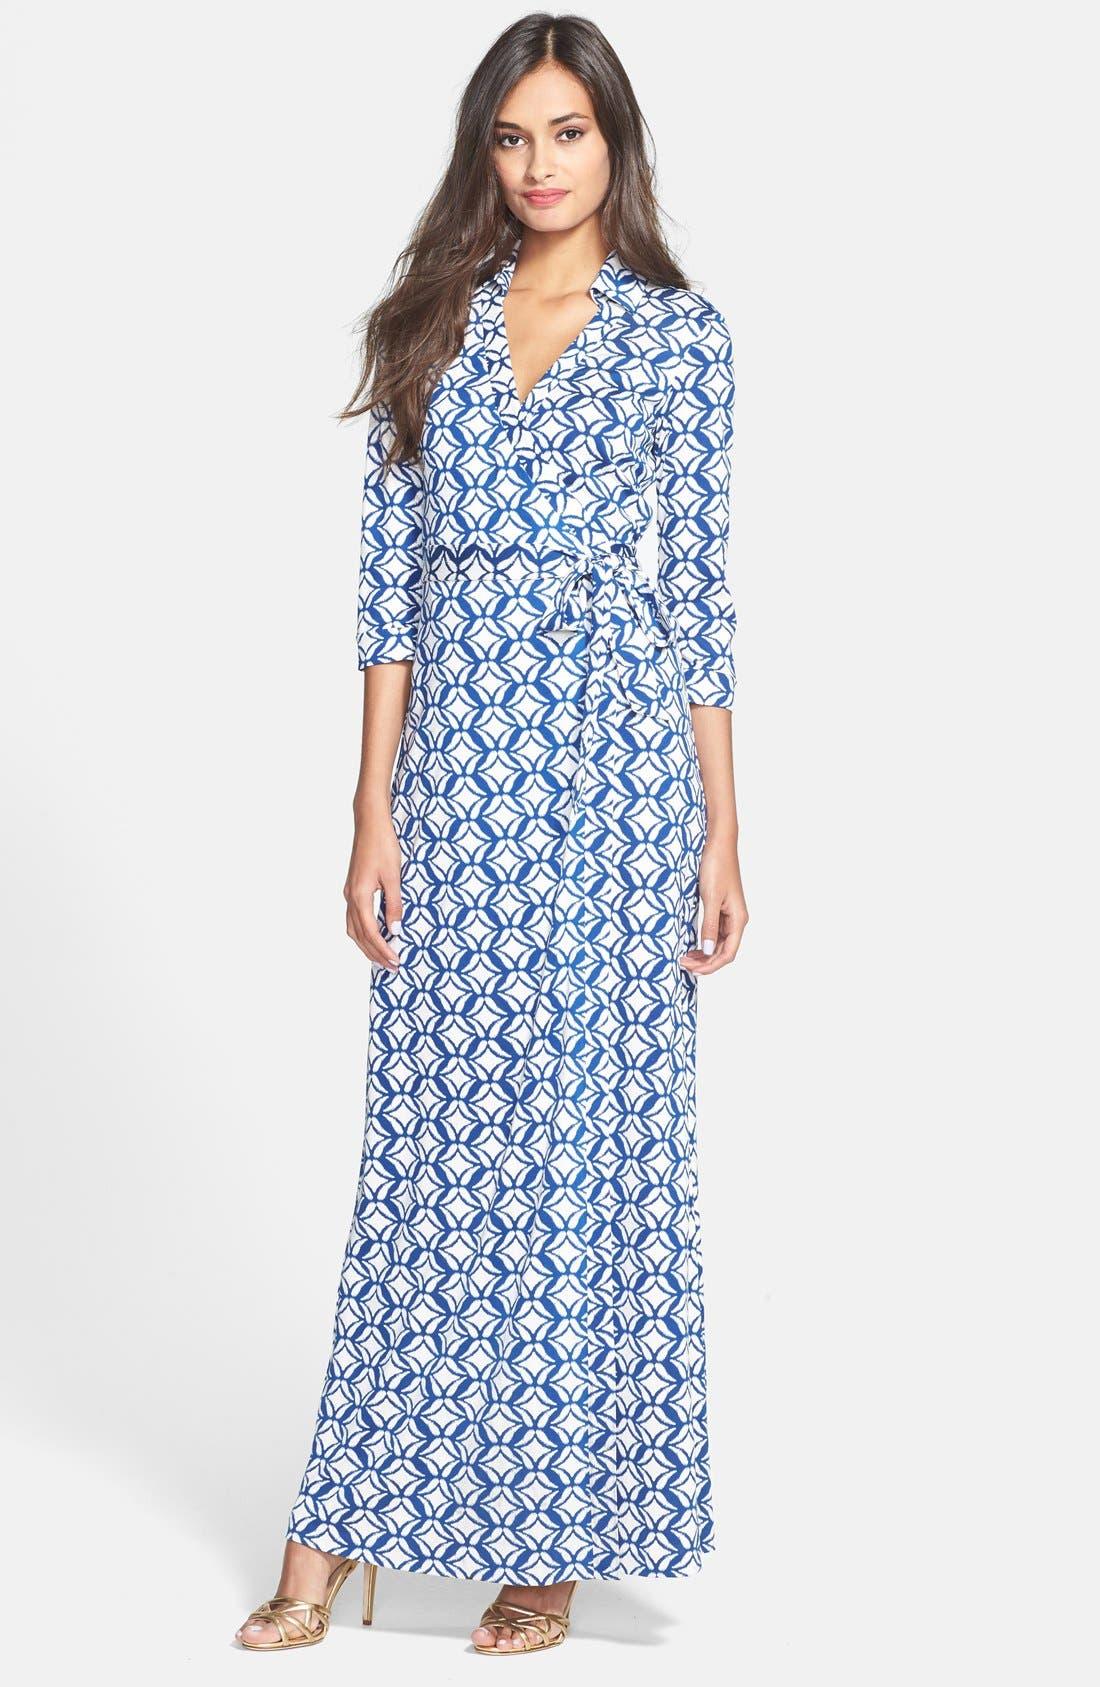 Alternate Image 1 Selected - Diane von Furstenberg 'Abigail' Print Silk Wrap Dress